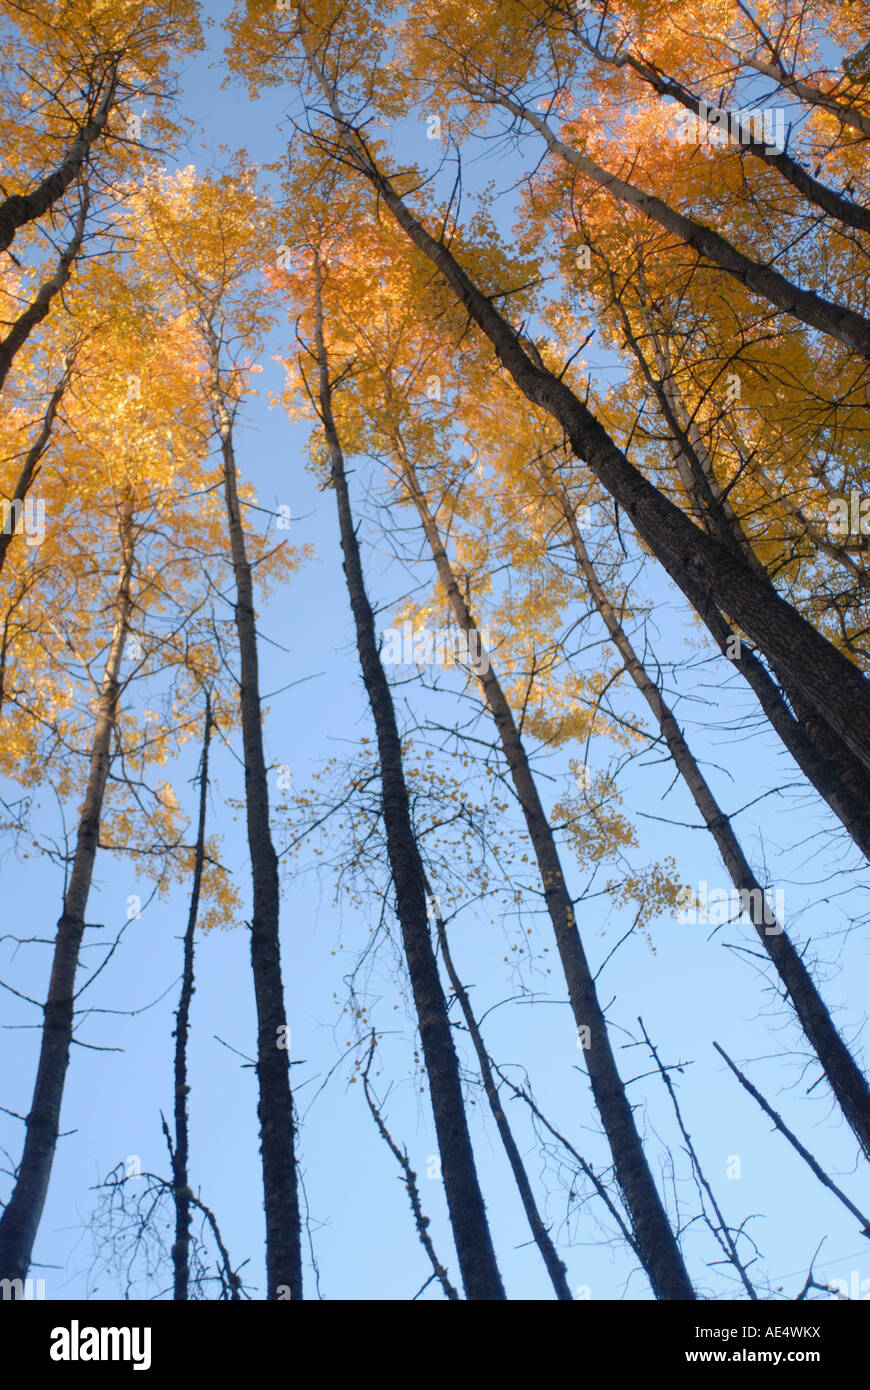 Aspen trees (Populous tremuloides) in late day light, Vashon Island, Washington state, United States of America, - Stock Image